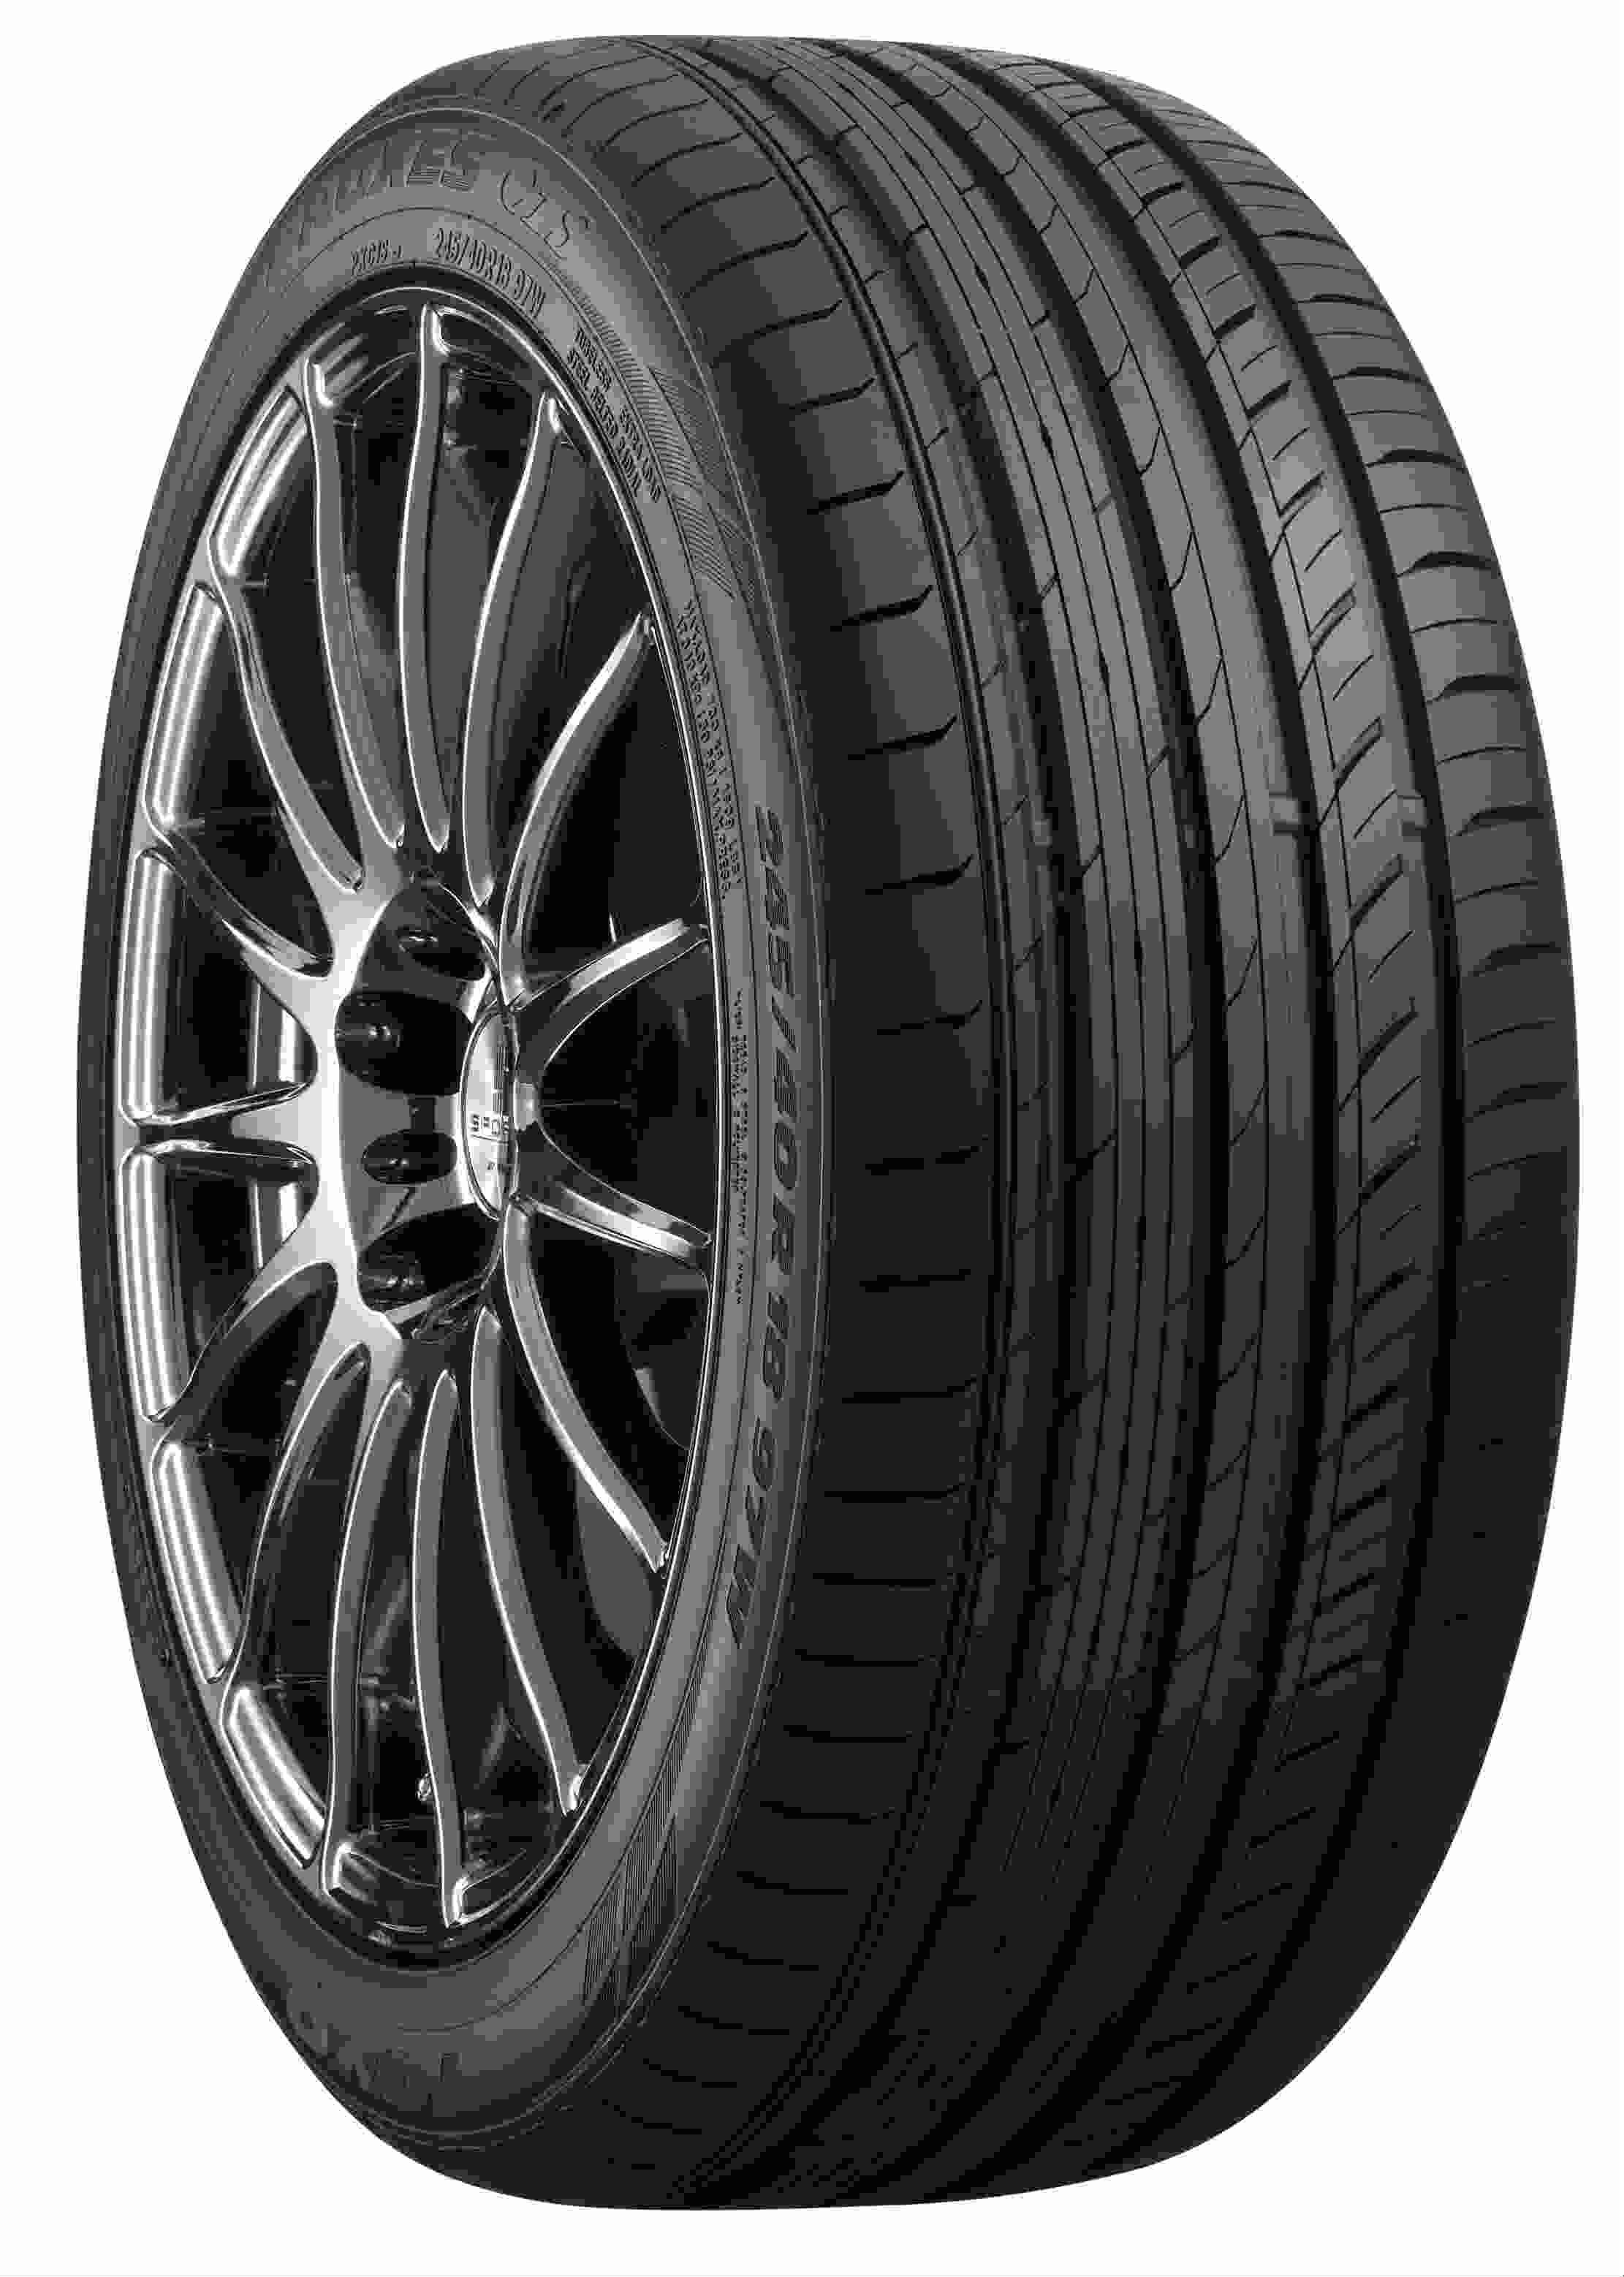 Neumático TOYO PROXES C1S 215/45R18 93 W